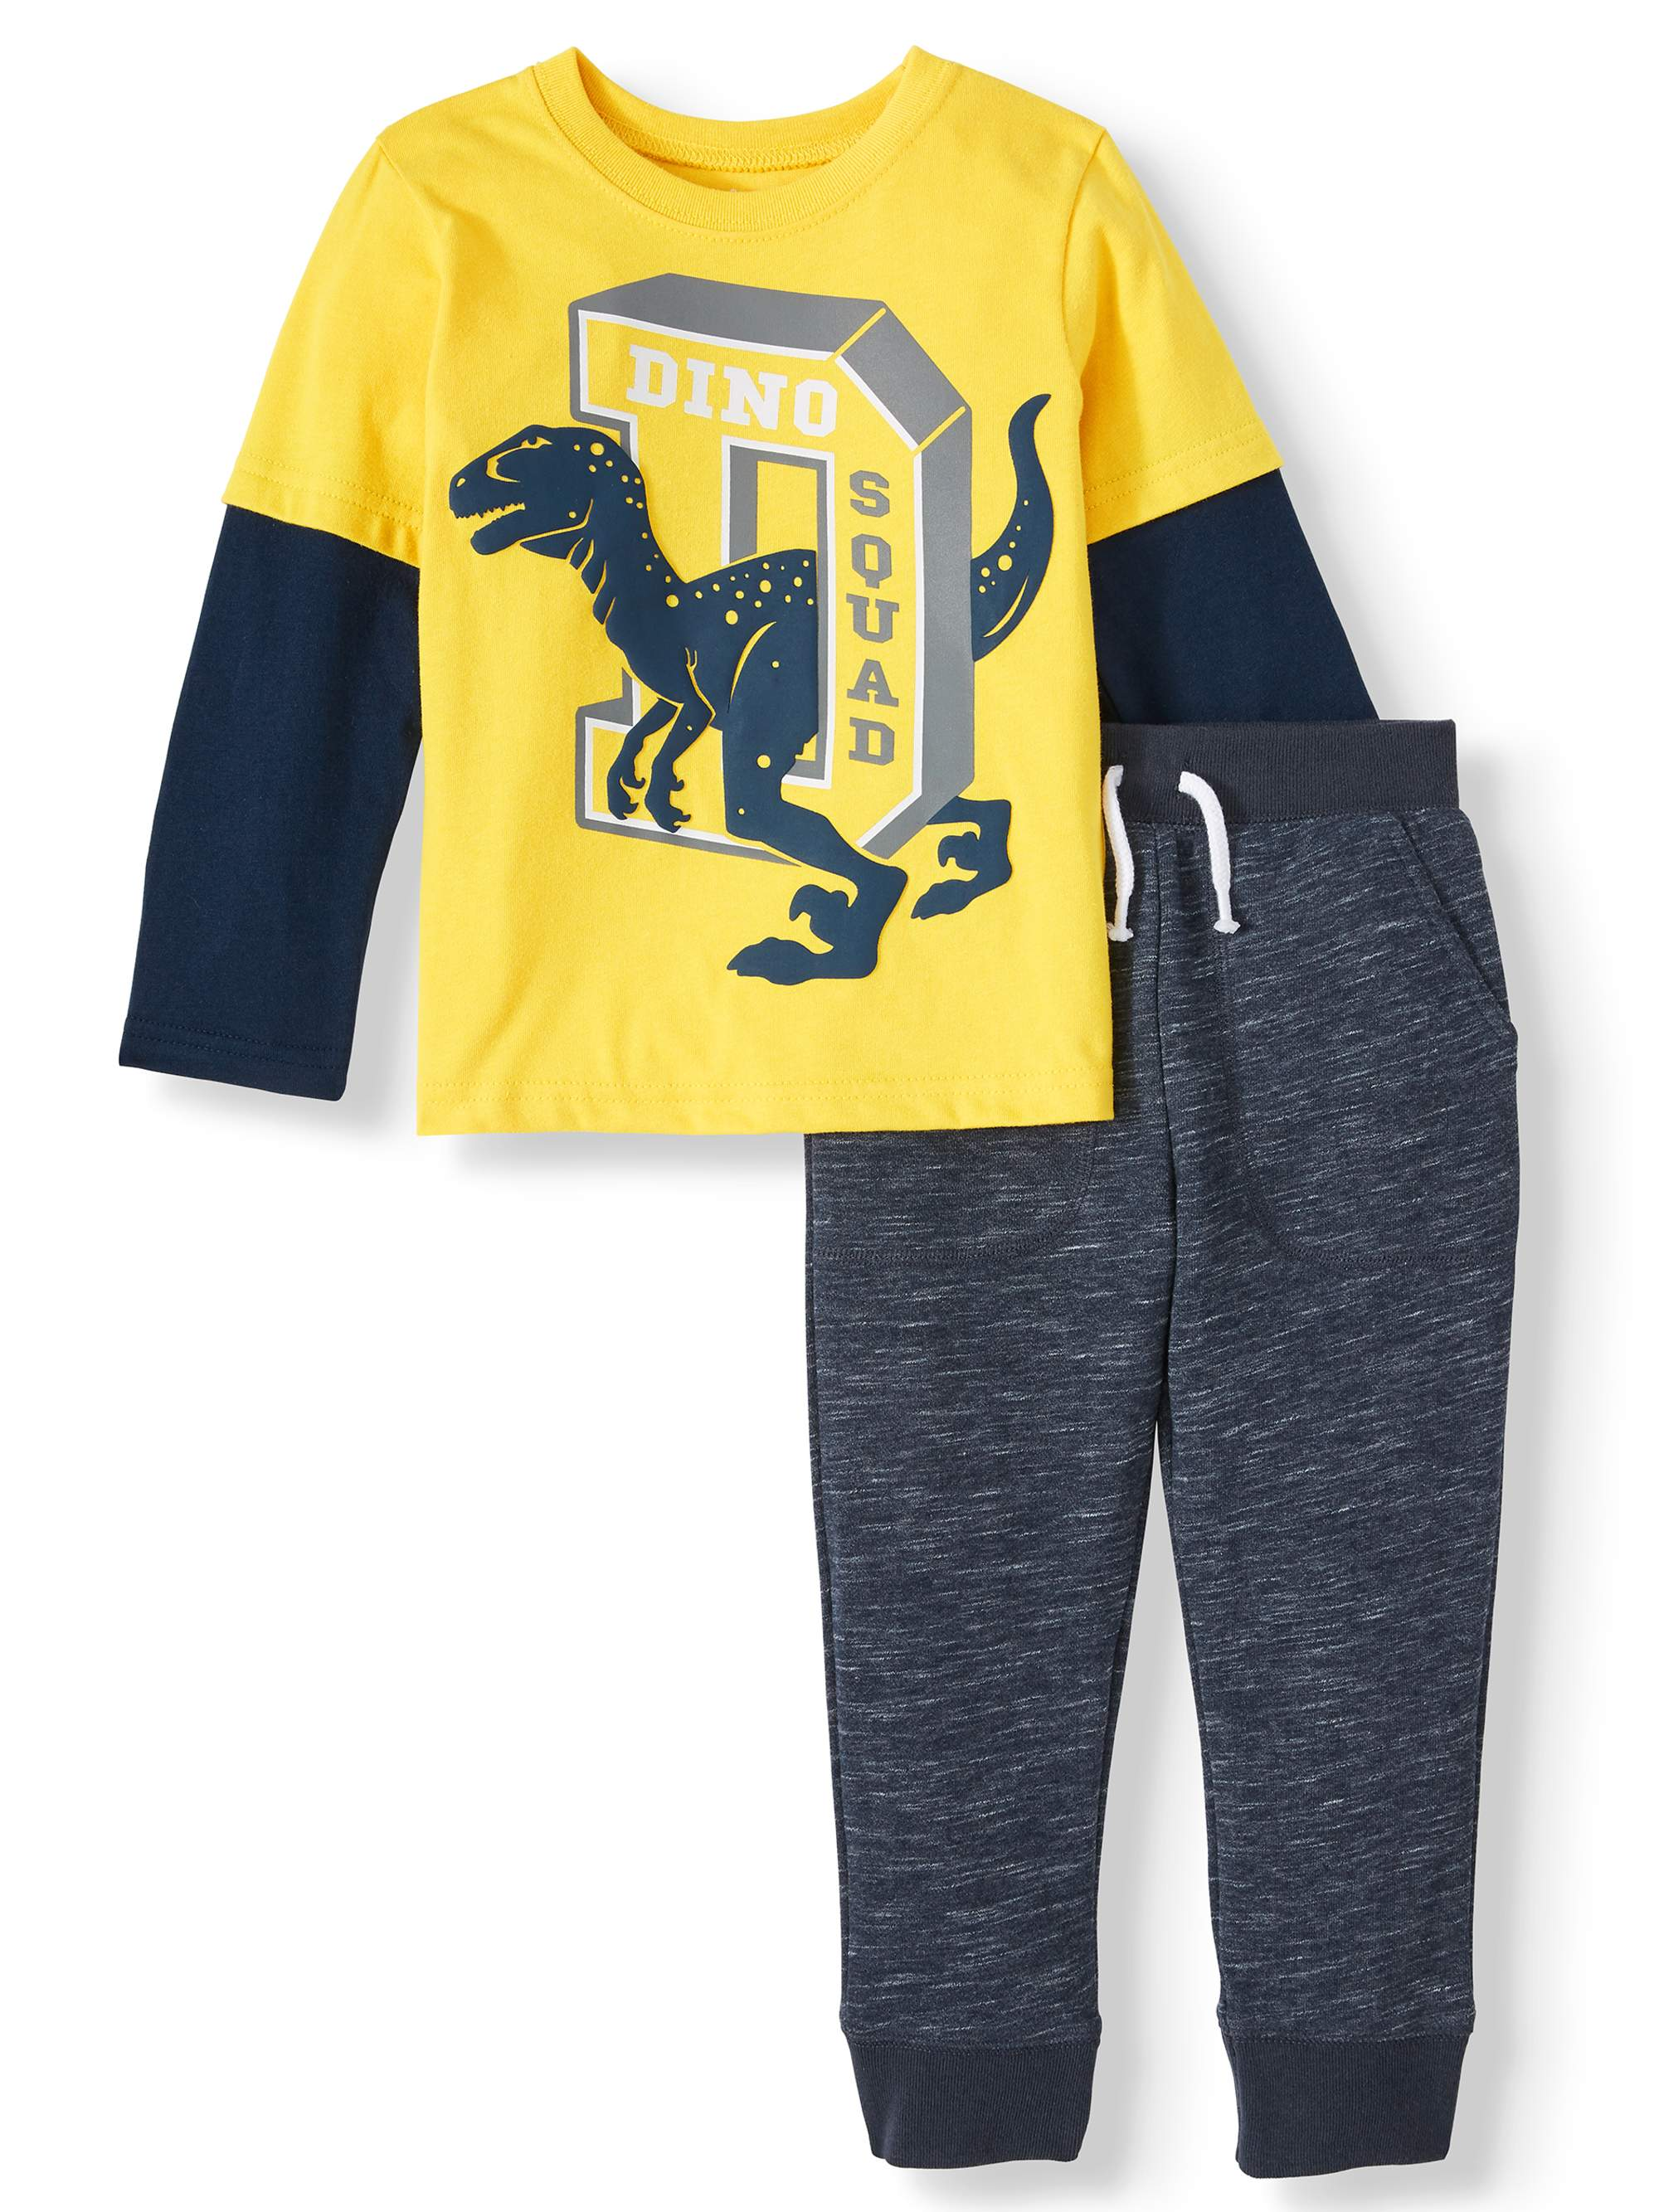 Boston Bruins BOYS SIZE 7 Reebok Hooded Sweatshirt and Pants Set